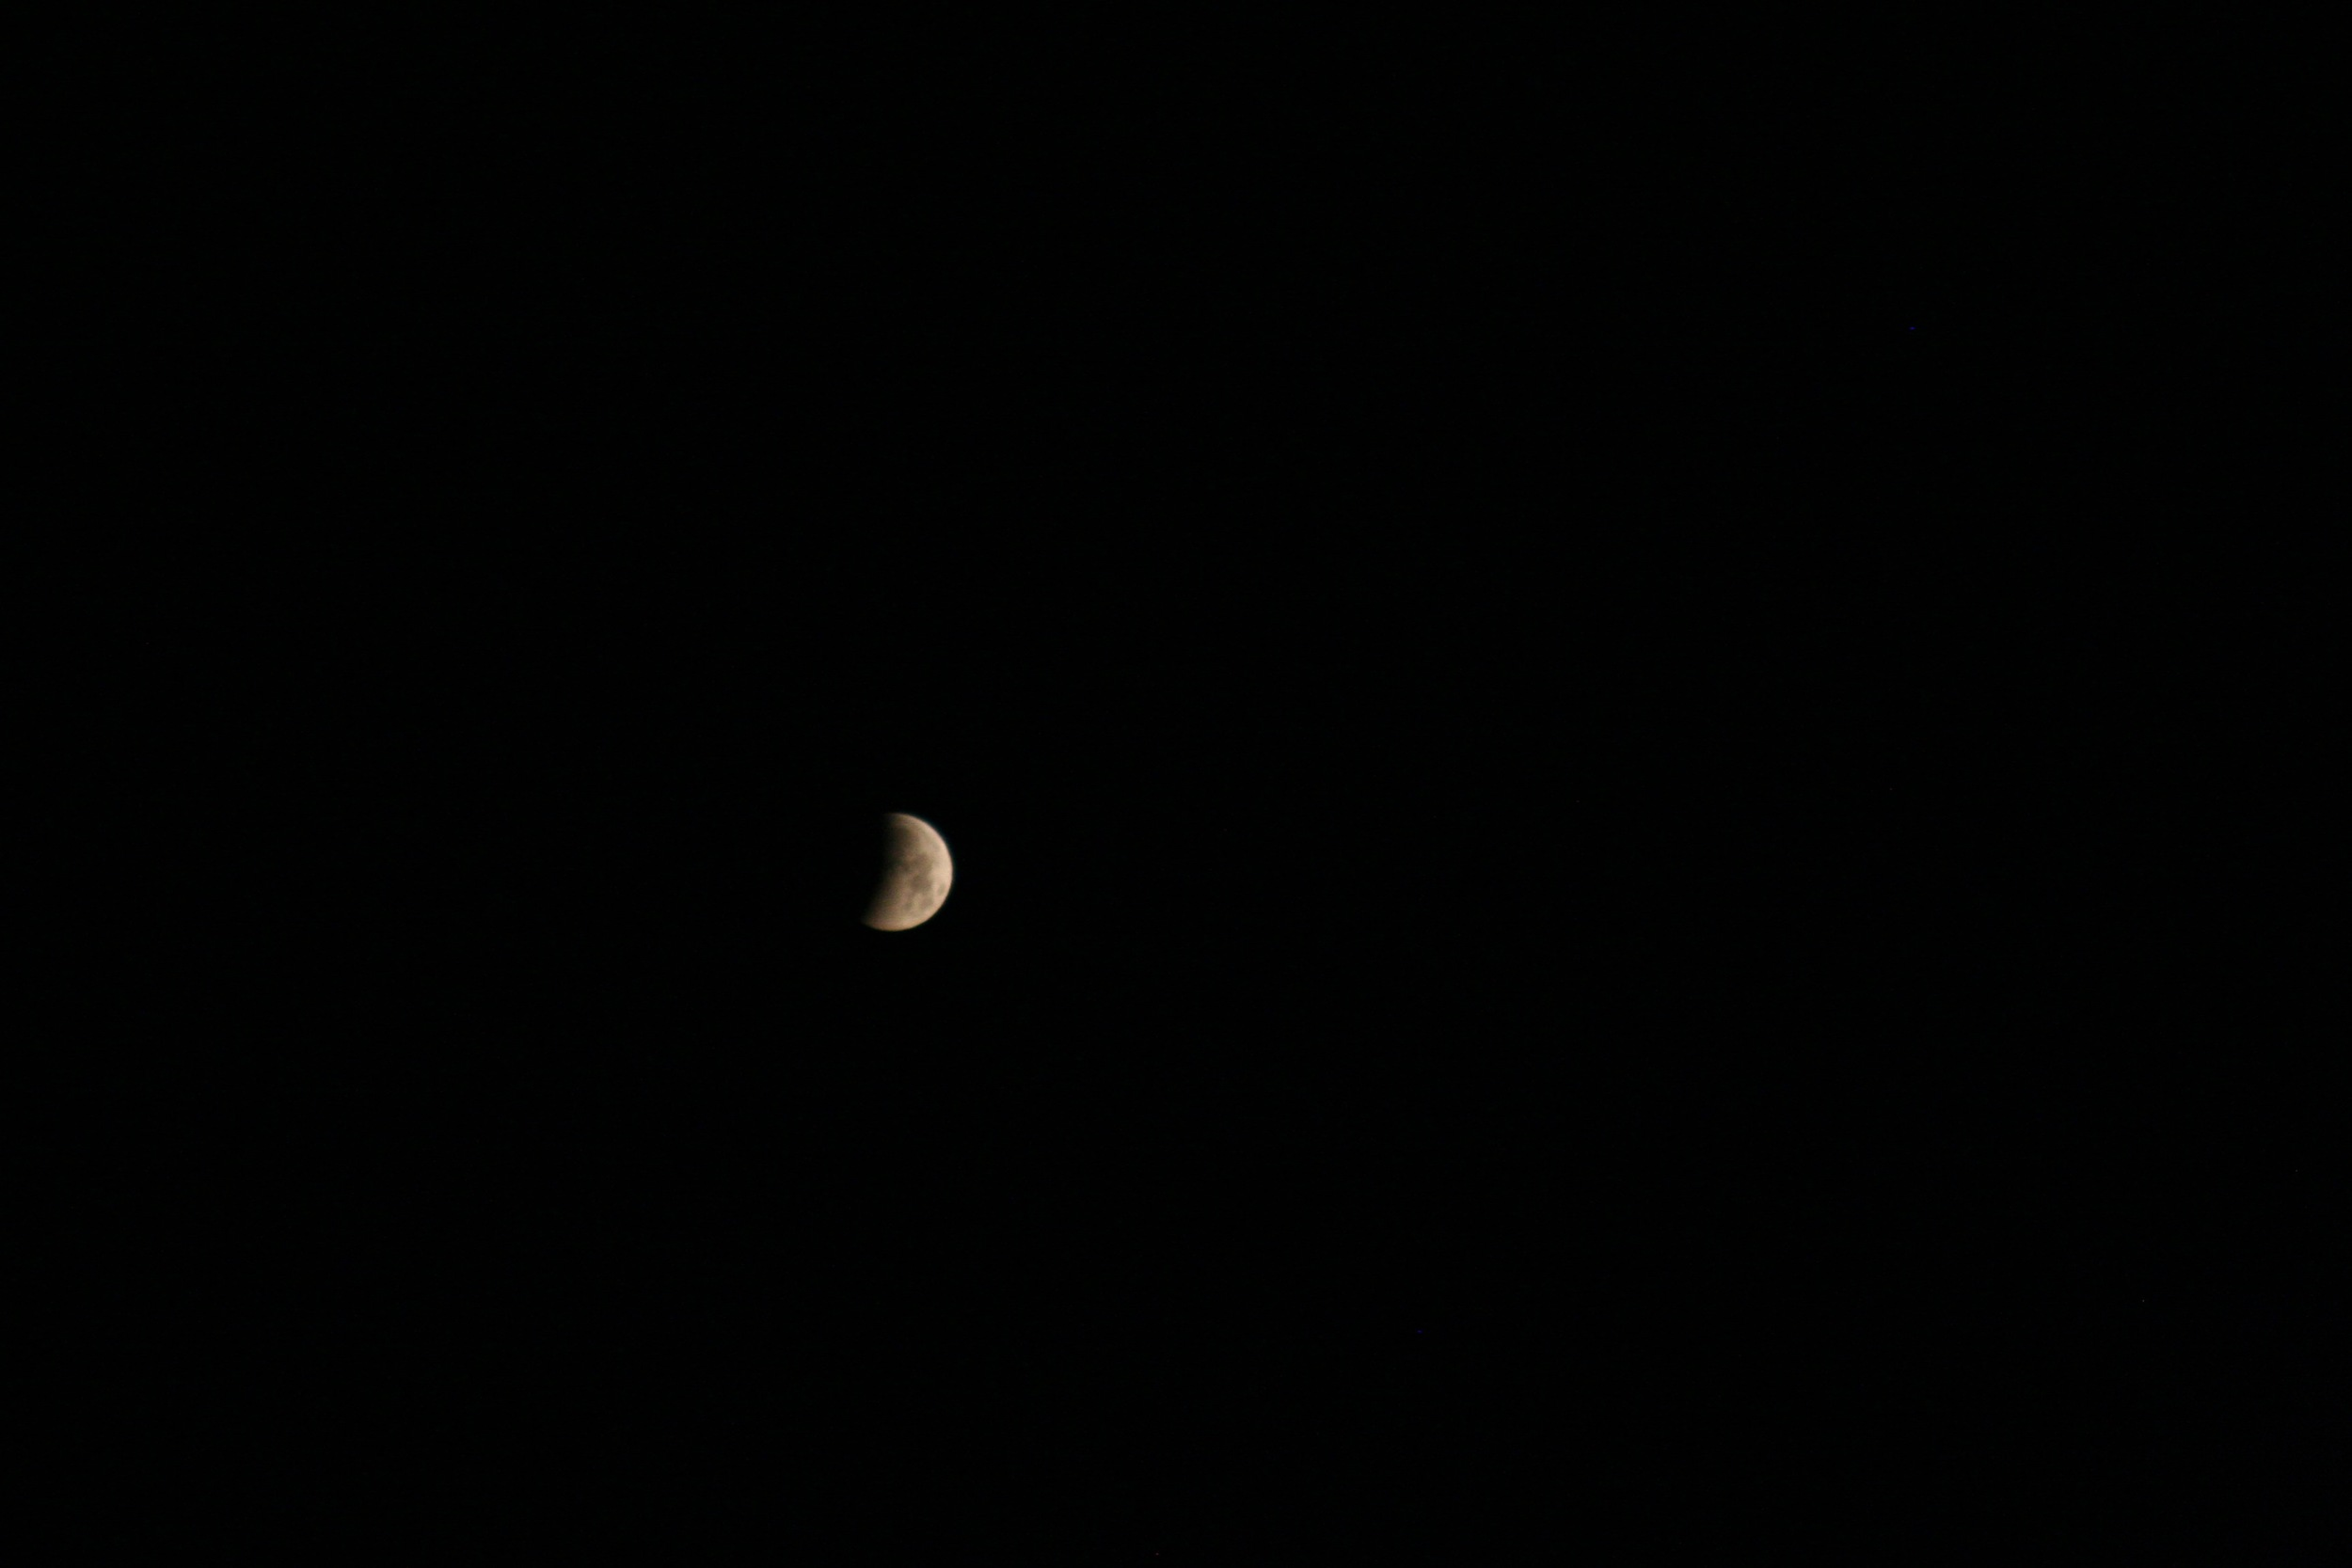 Lunar Eclipse April 20155.jpg